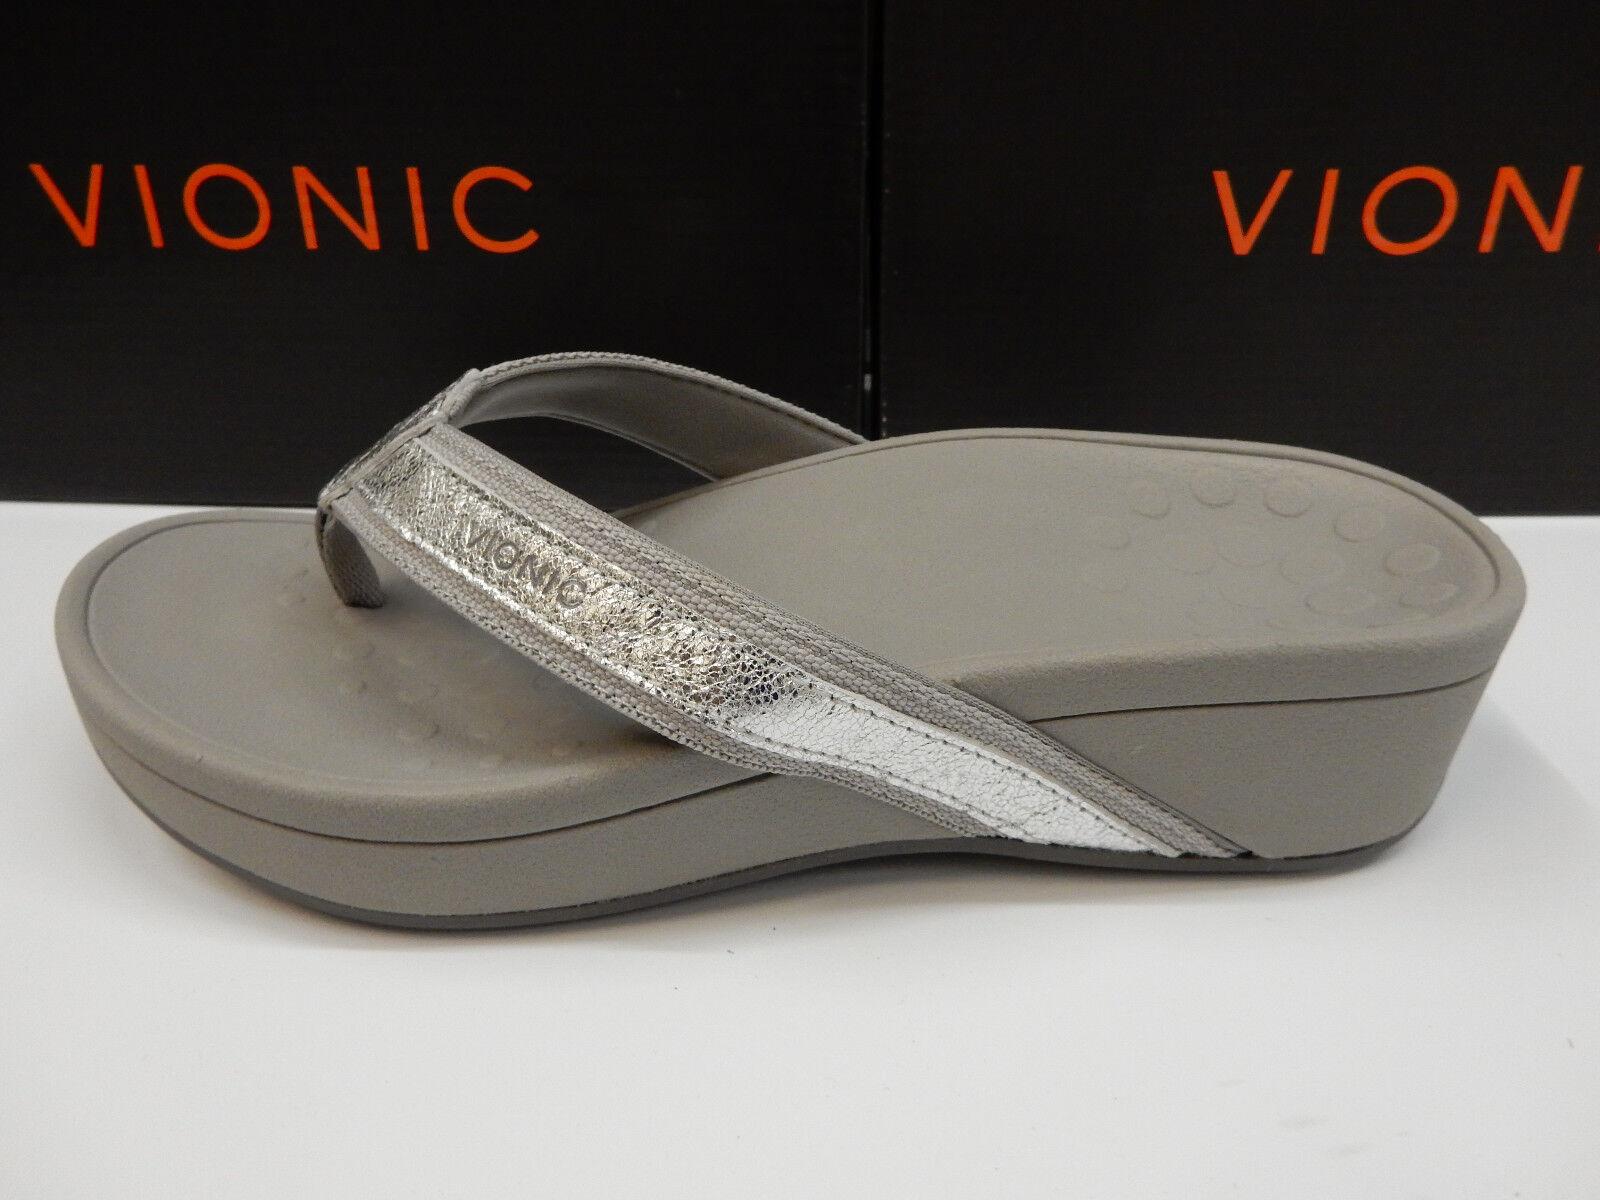 Vionic Vionic Vionic Womens High Tide Metallic Silver Size 9 fa730d